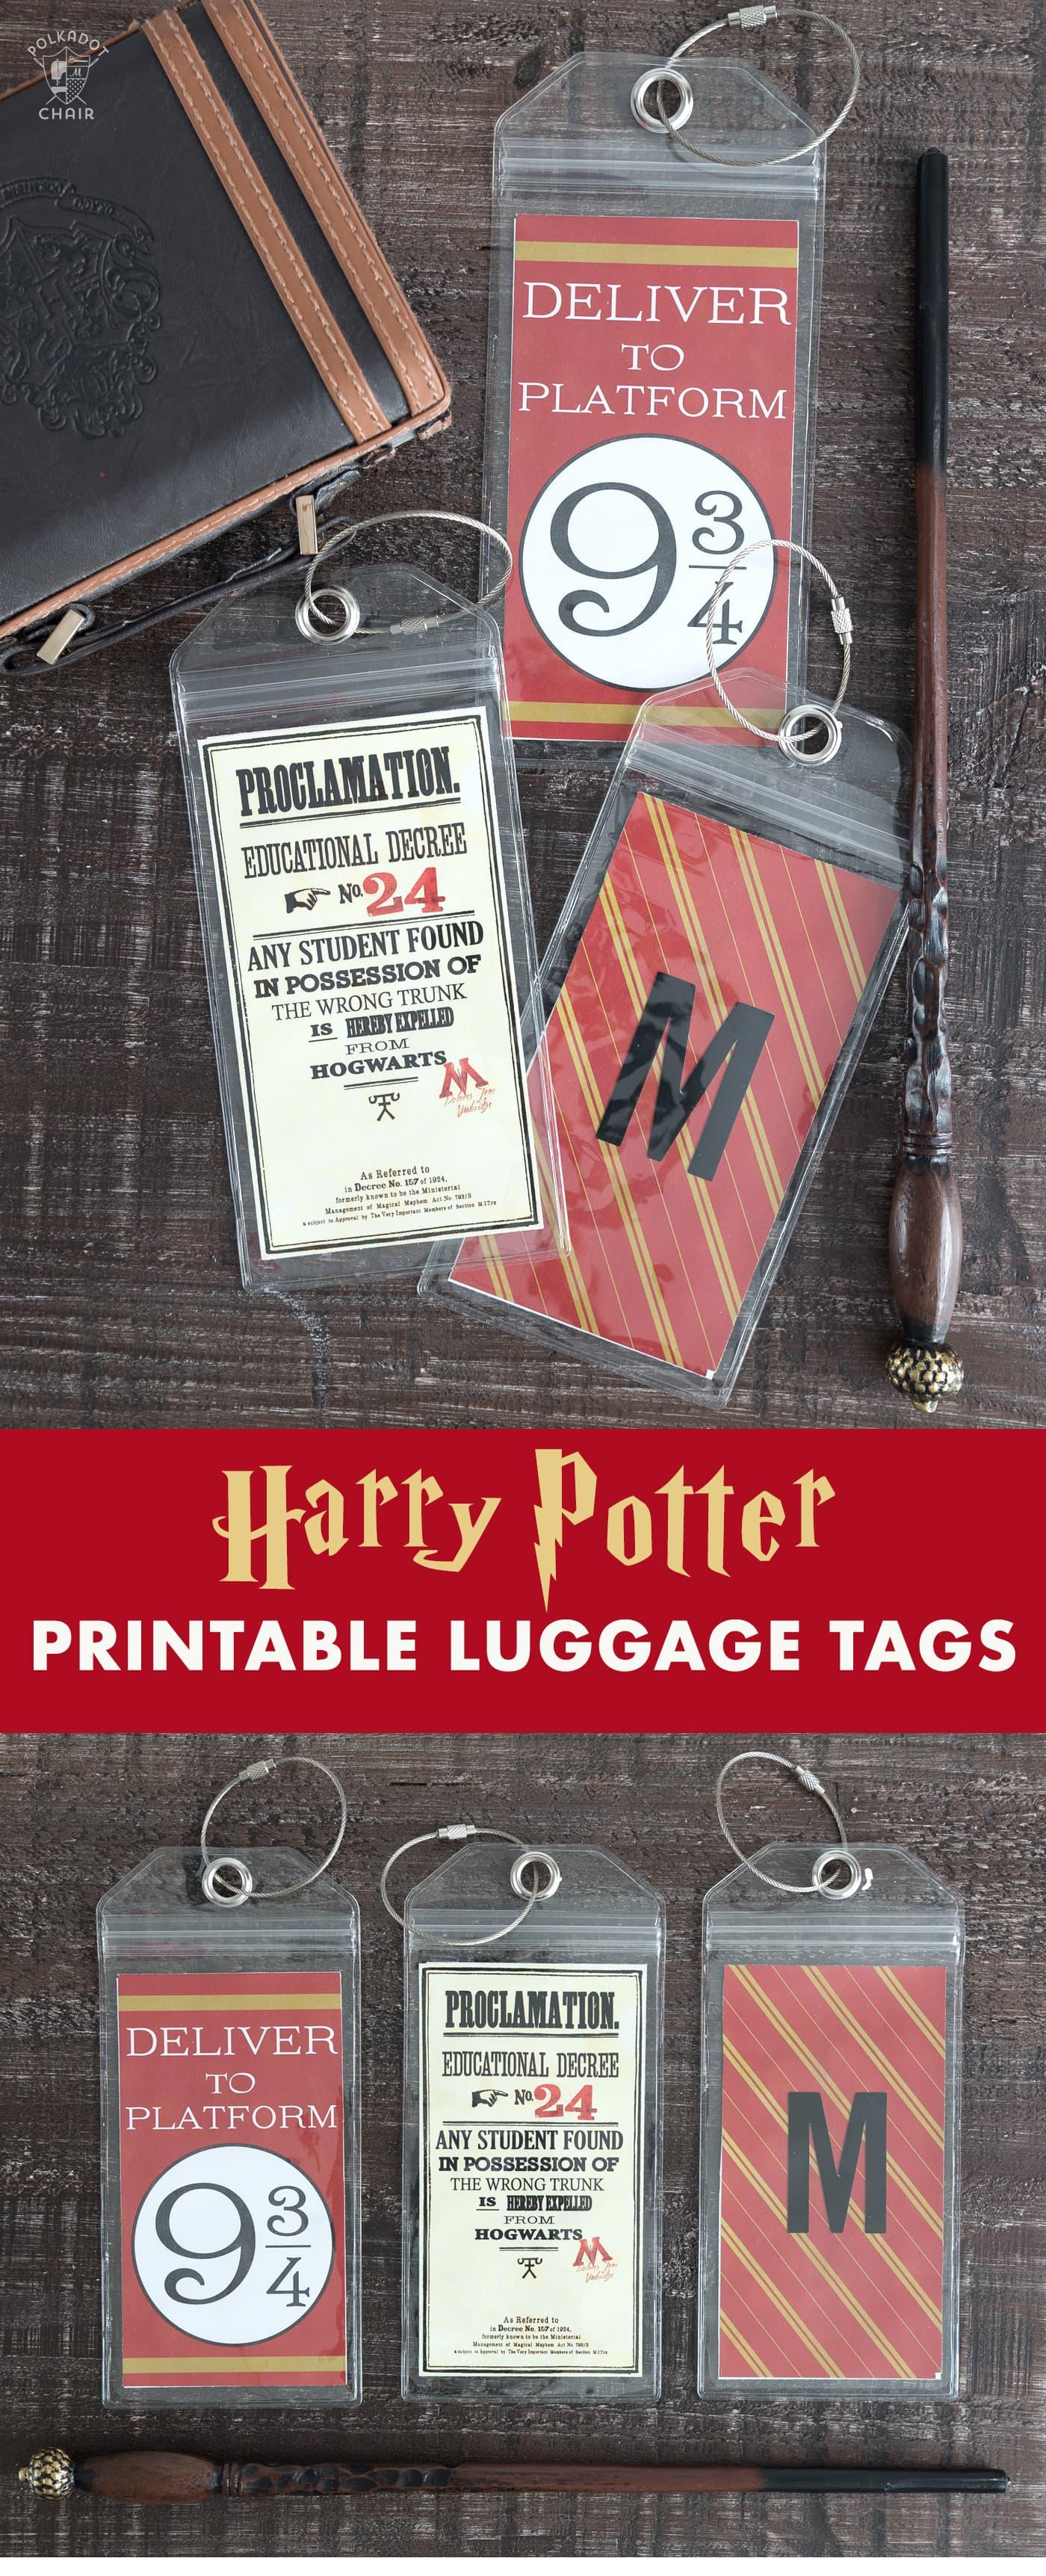 Harry Potter Printable Luggage Tags